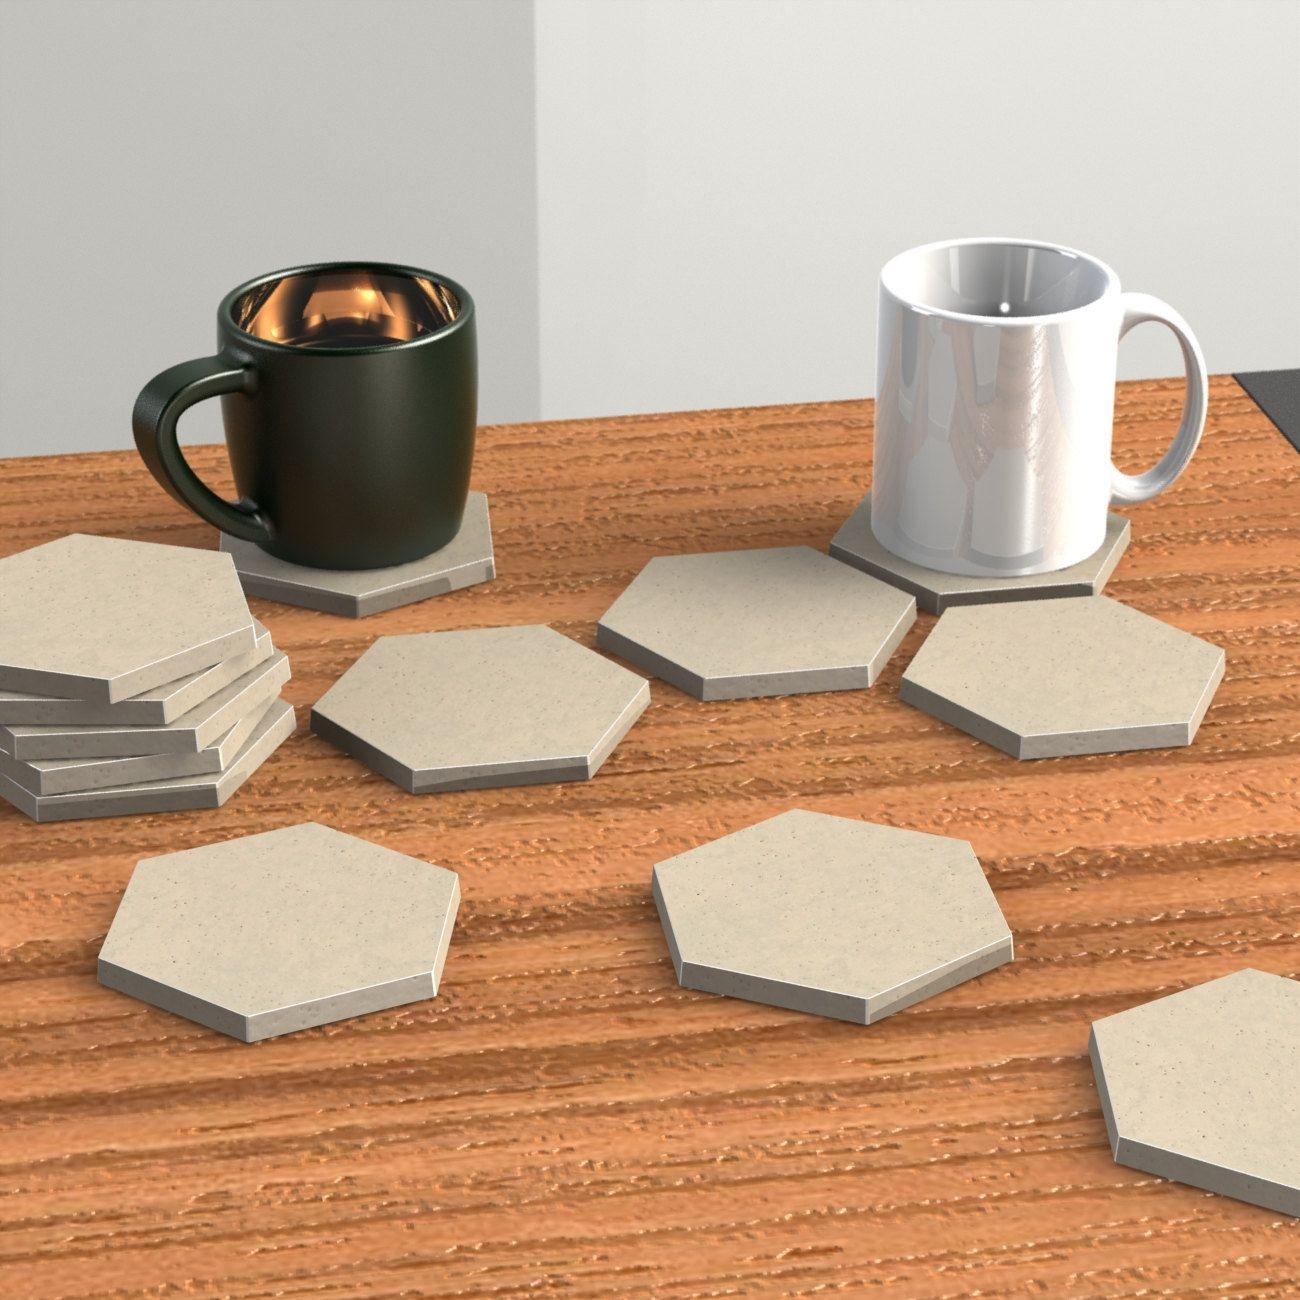 projects design unique coasters. Hexagon Coaster Mold Concrete Geometric  38 00 USD by BoldPrints